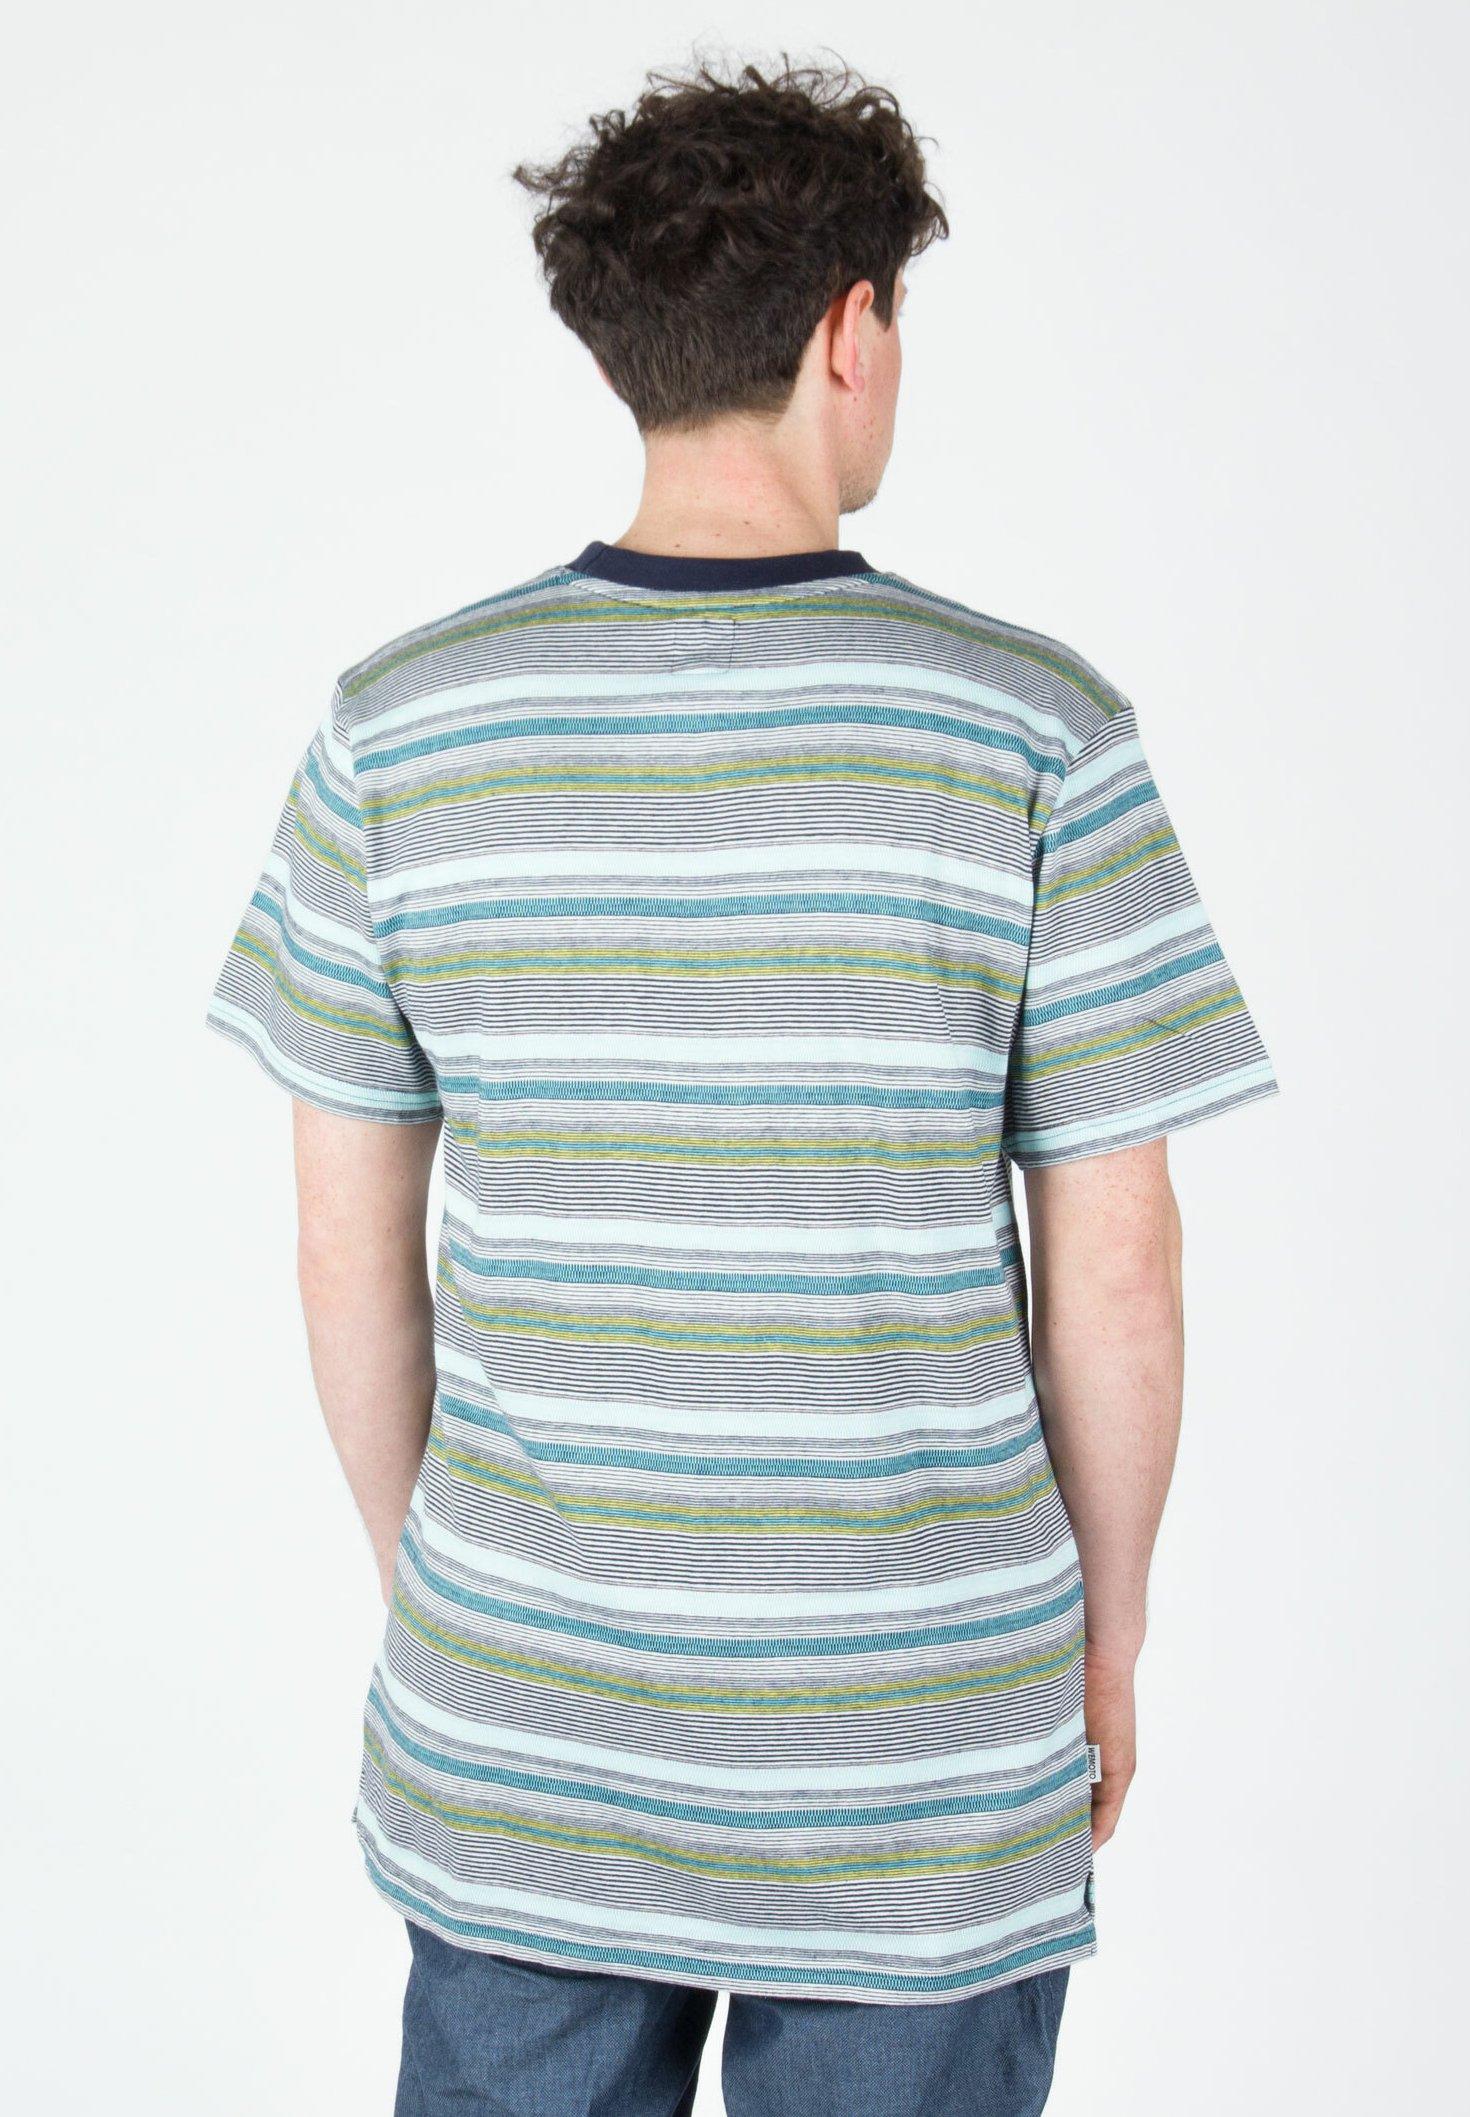 Wemoto Trail - T-shirt Imprimé Green y4dif2p